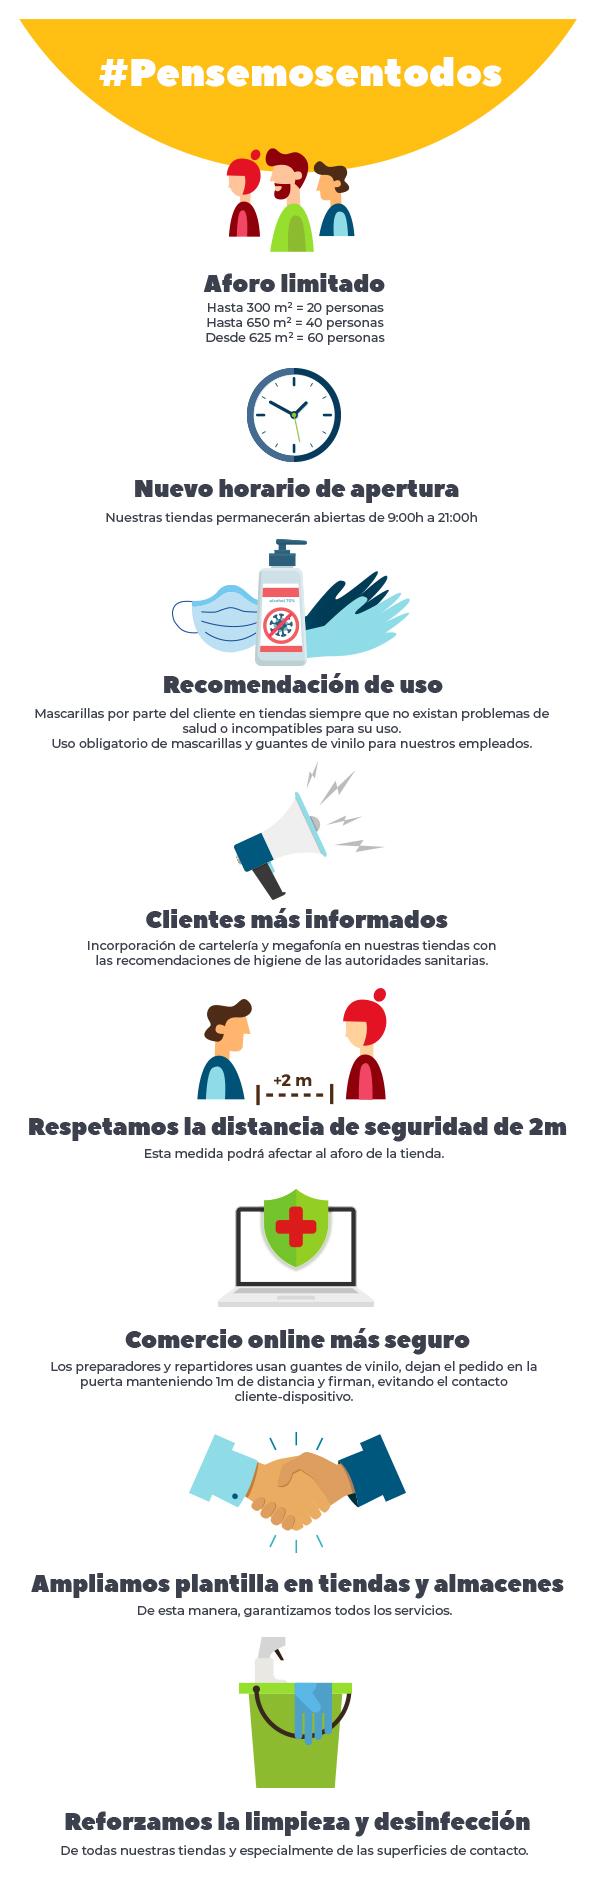 9130_S_DIA_DIA_dia.es_website_inne_Health&Safety_600x1900_Vertical_22-05.jpg